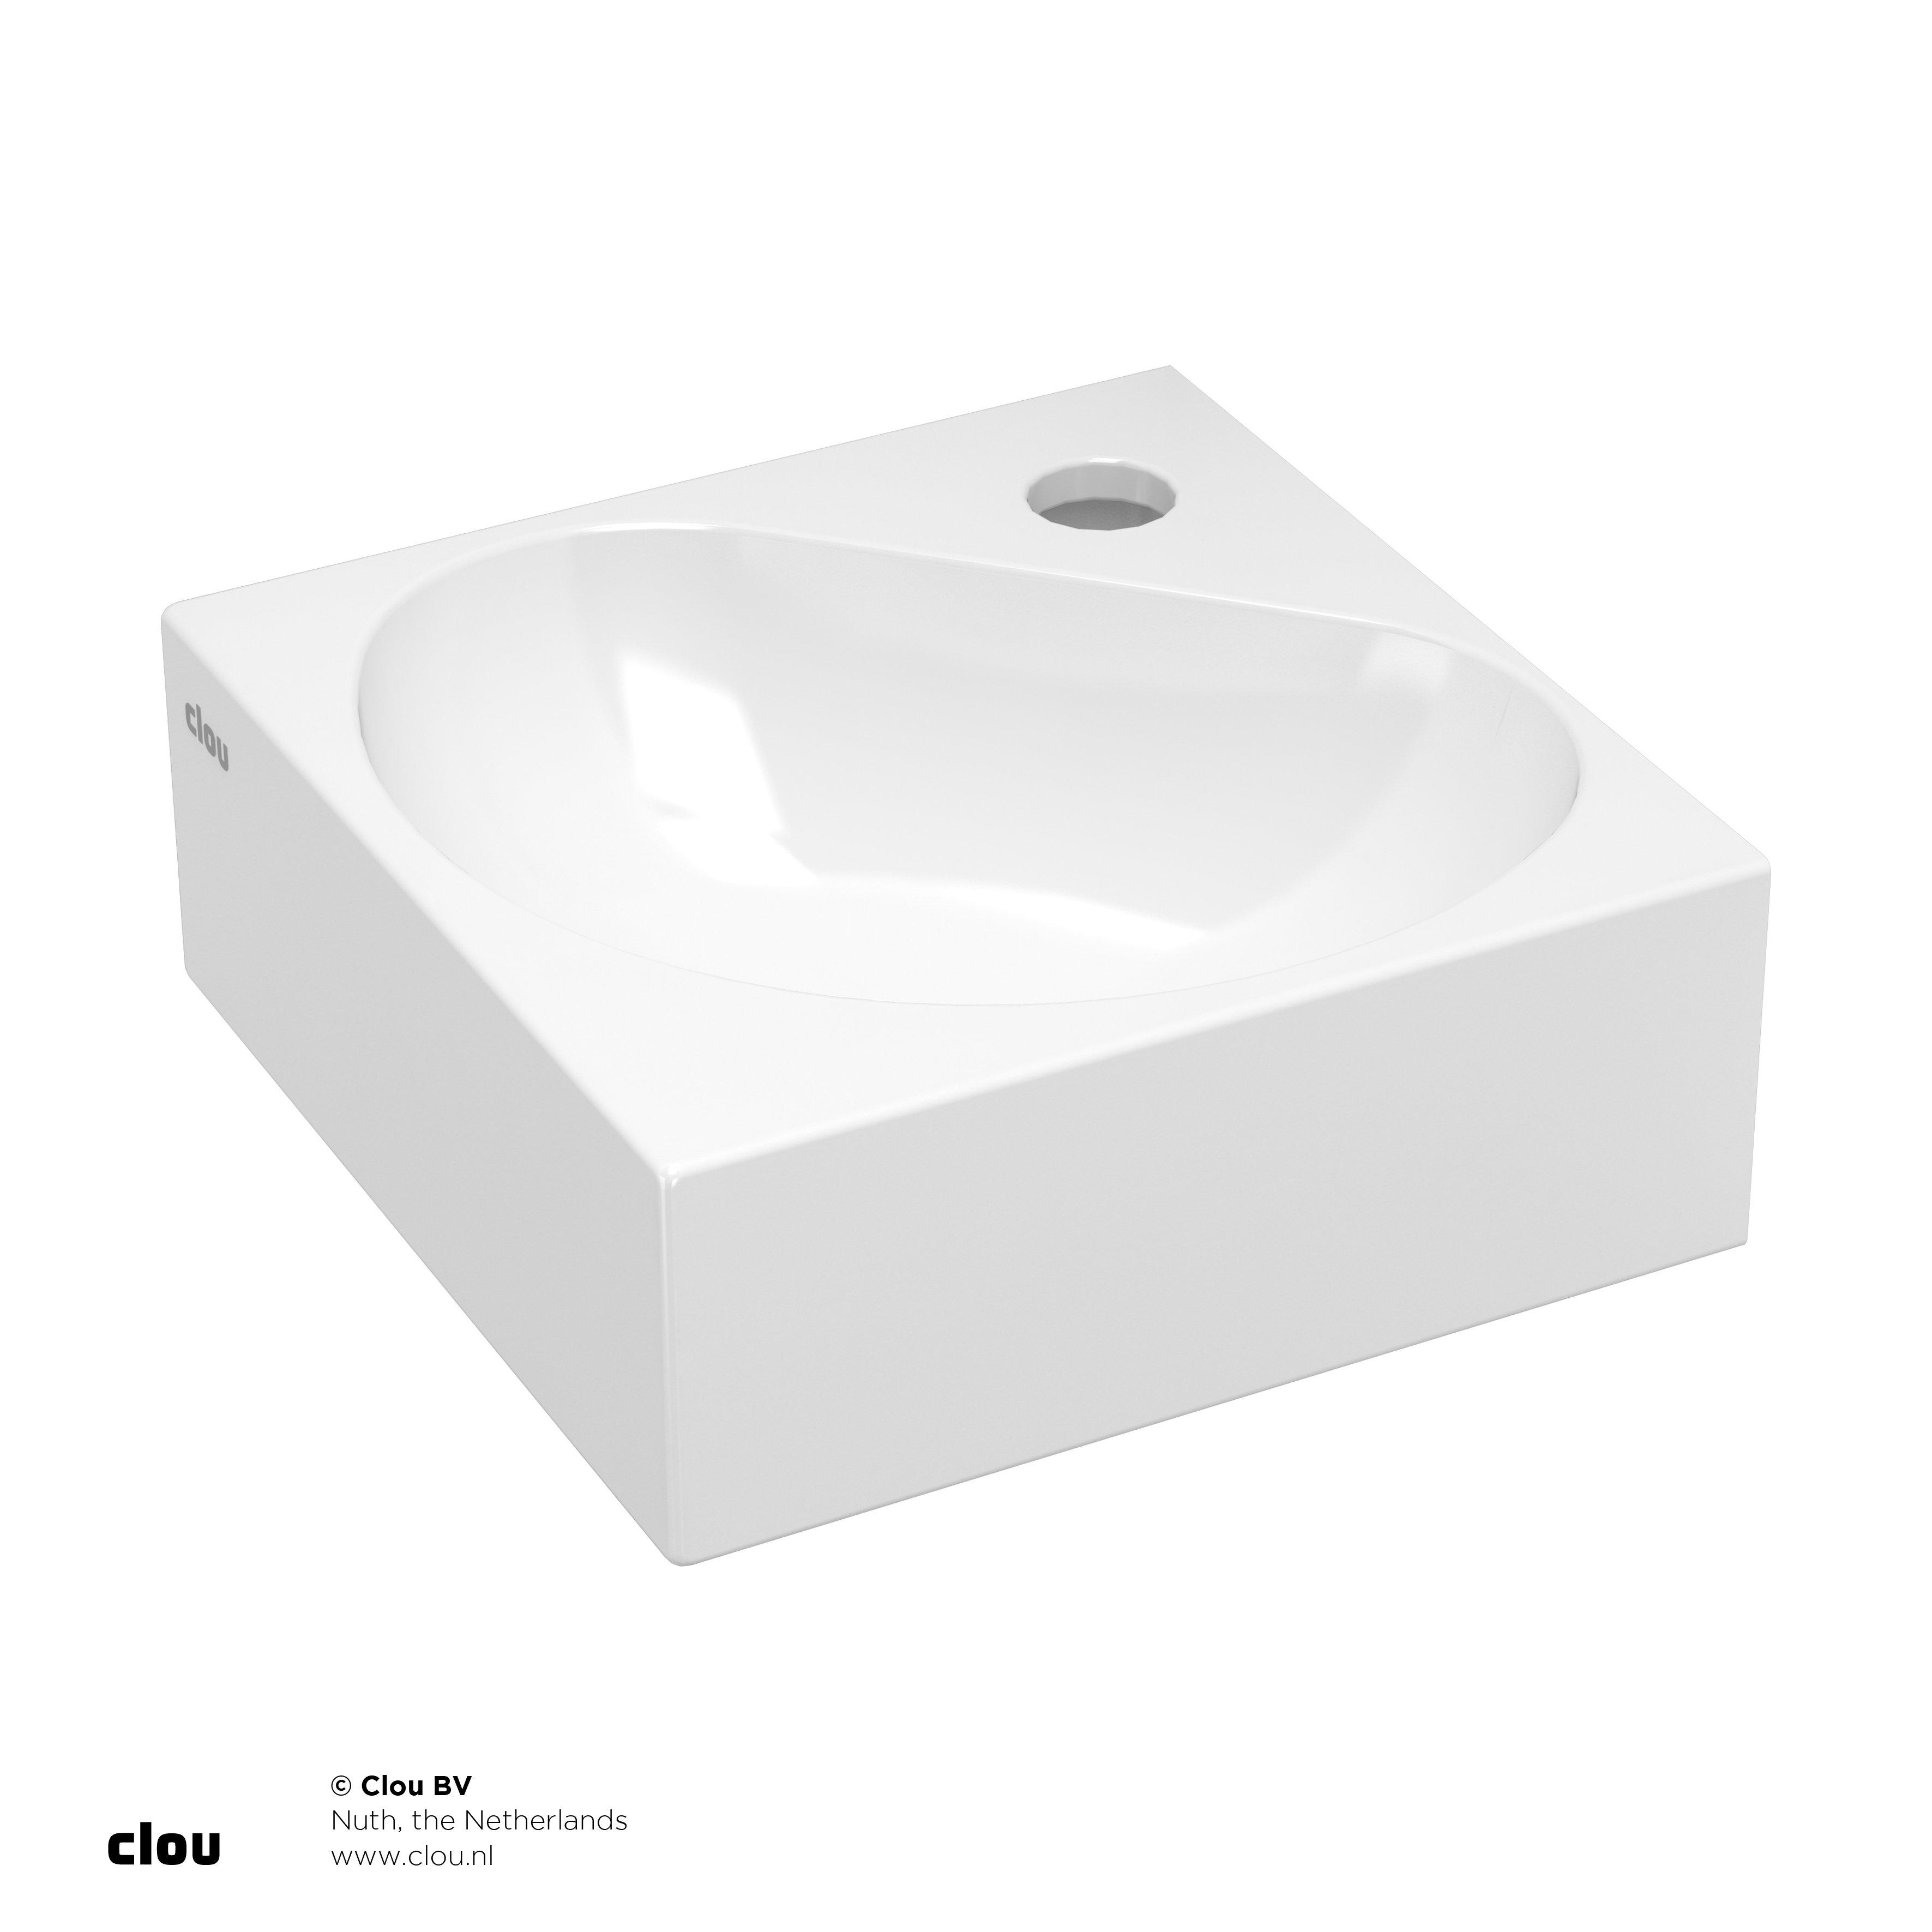 Clou Flush 5 hoekfontein 27cm, met kraangat, wit keramiek